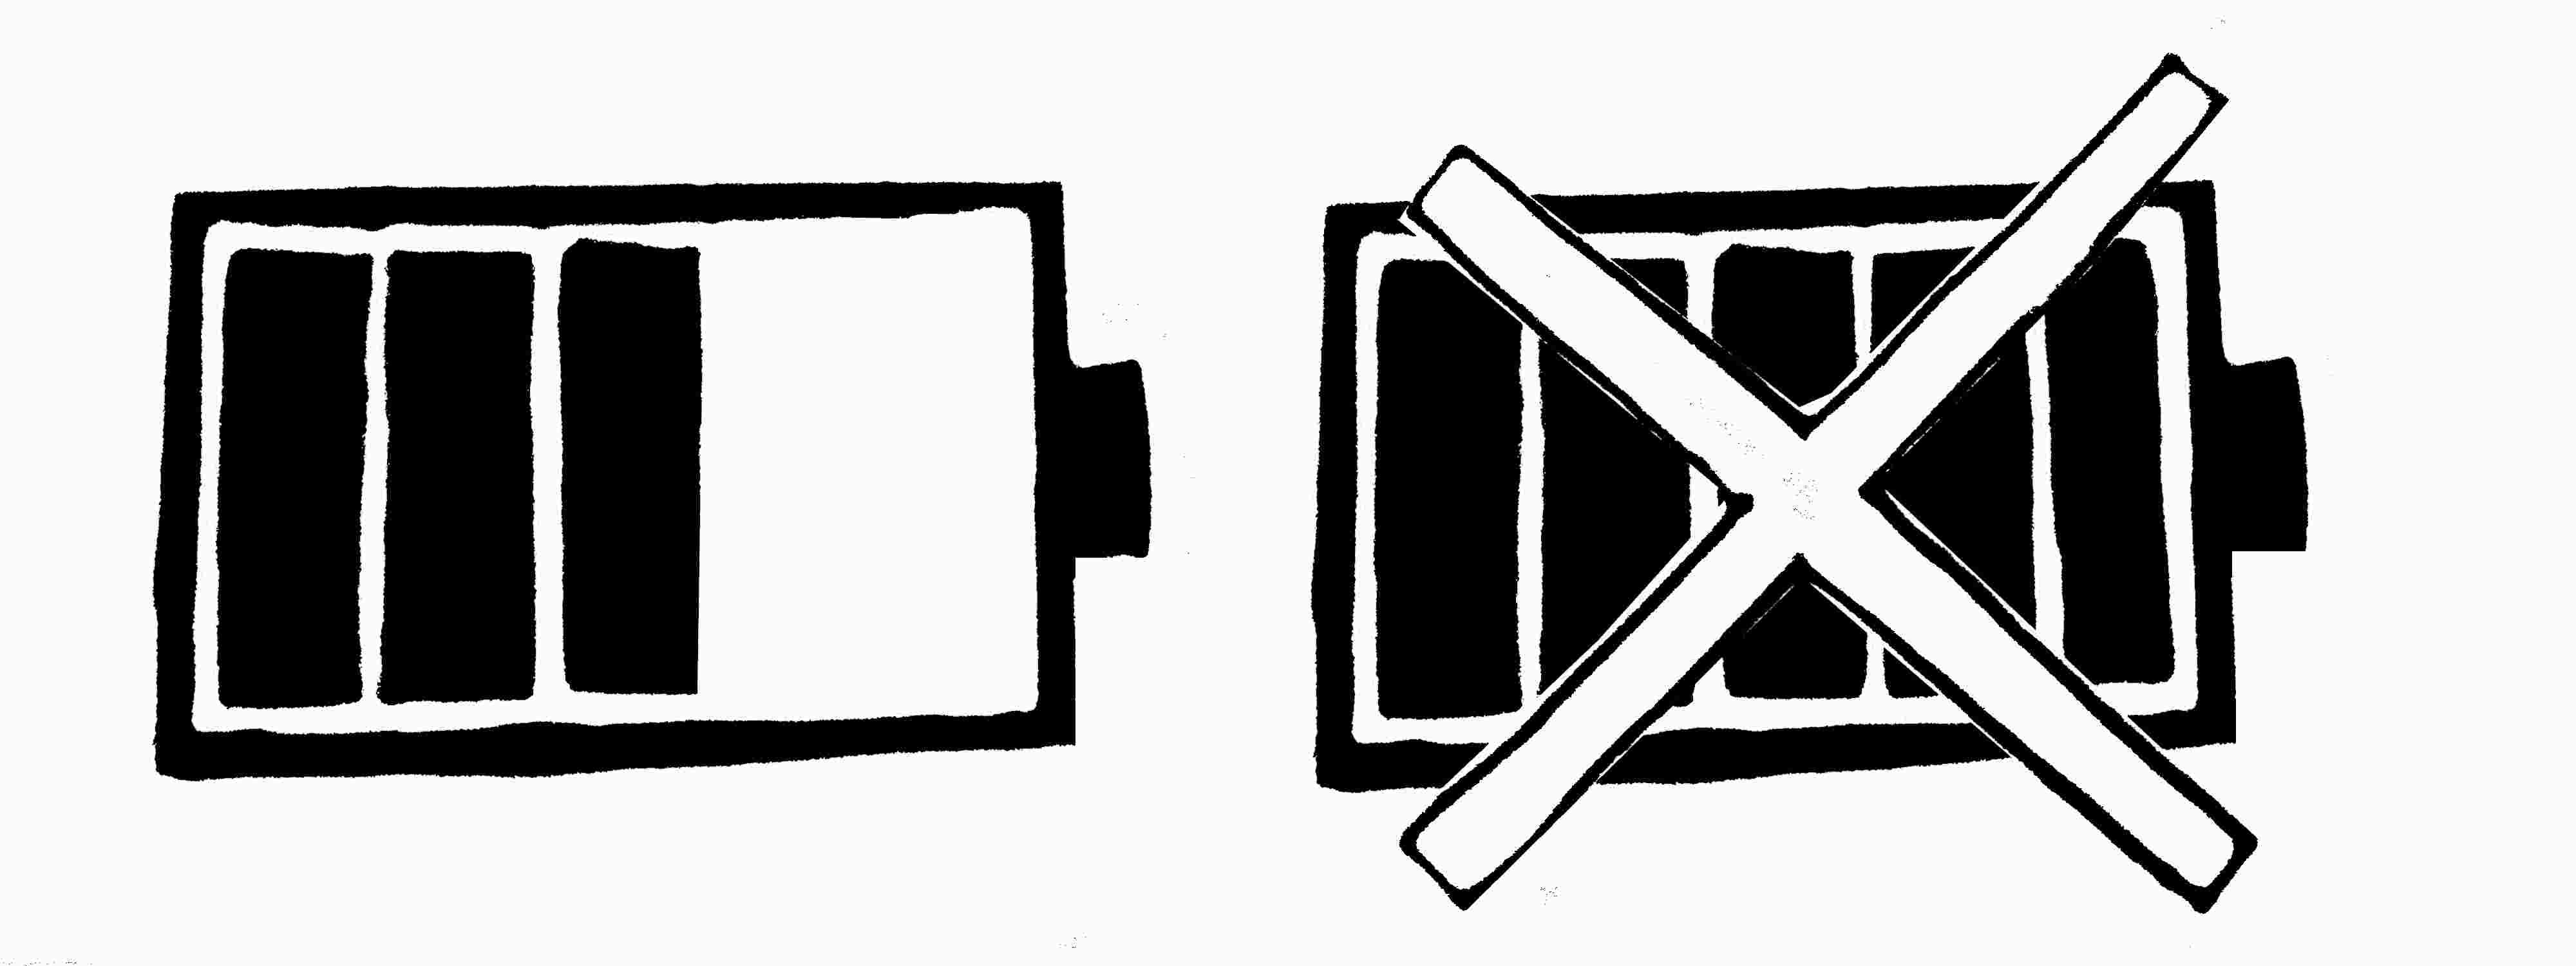 Battery clipart sketch. Lessons solar lampcircuitdesign draft